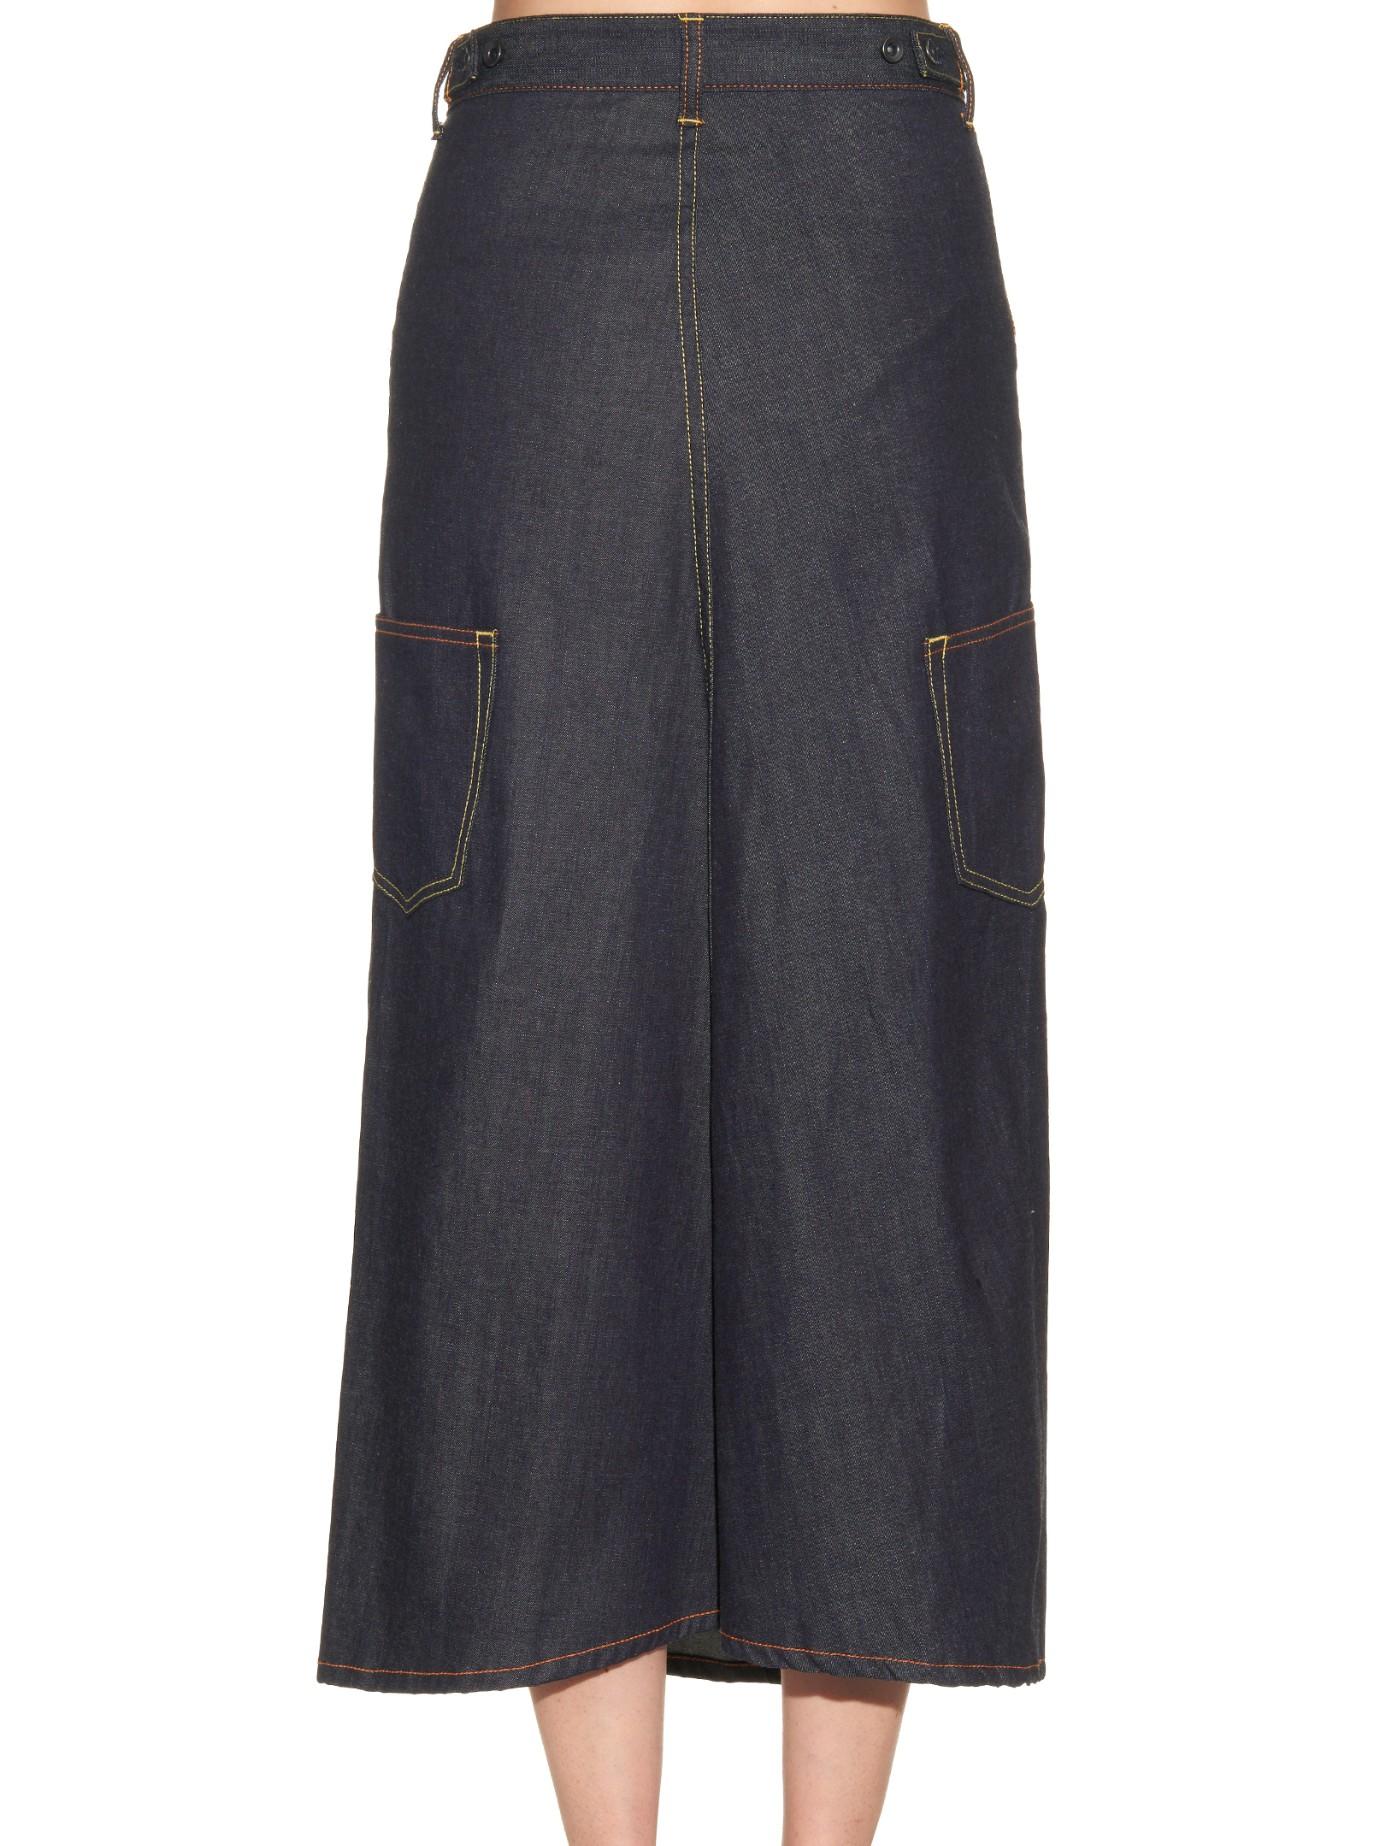 Y's yohji yamamoto A-line Denim Maxi Skirt in Blue | Lyst